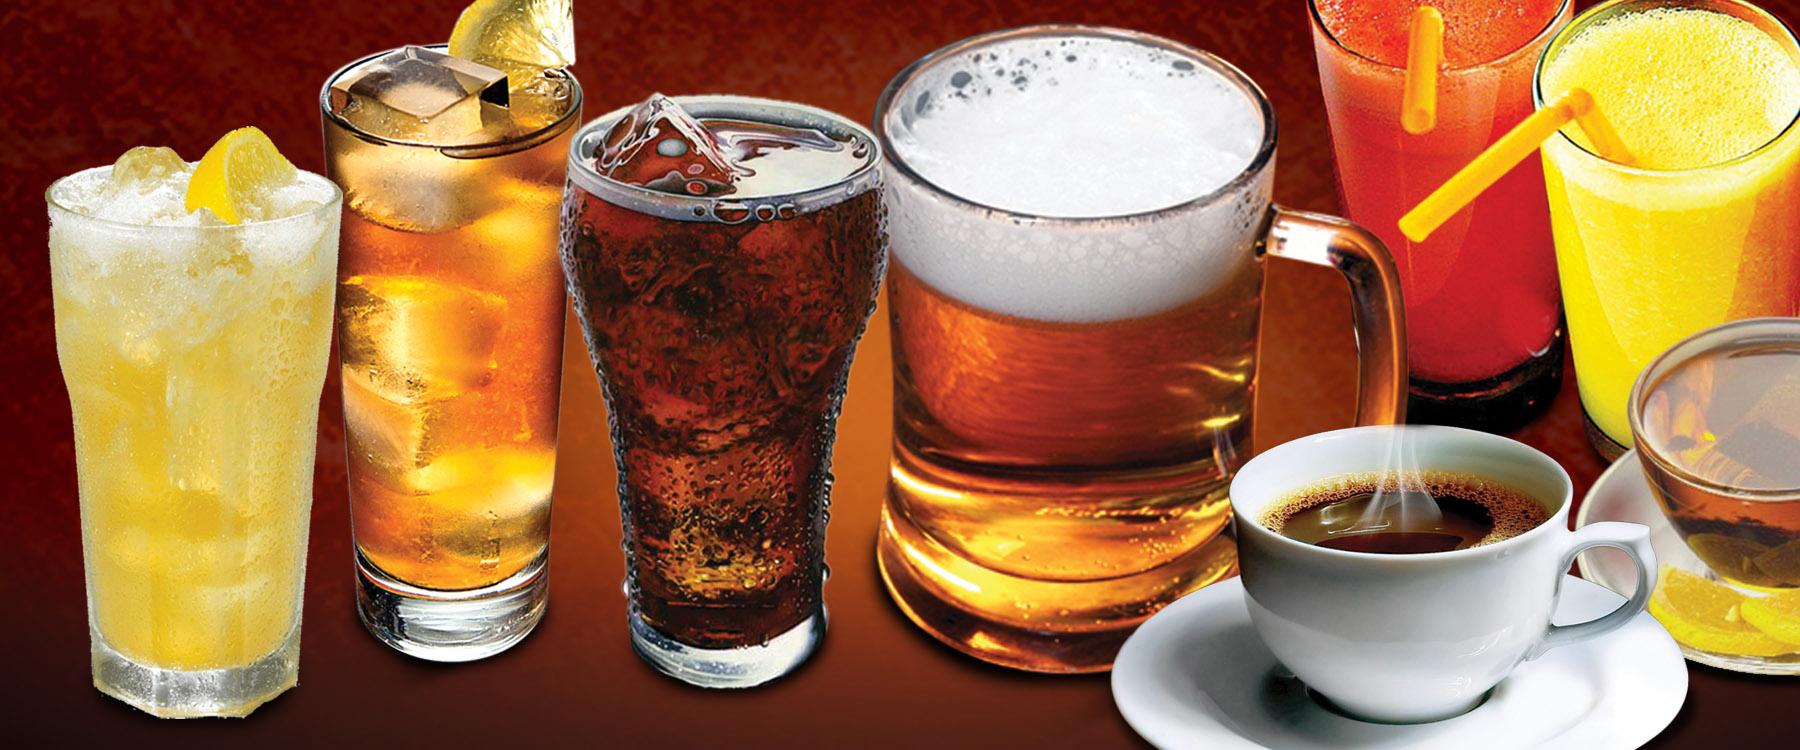 DRINK ALL-YOU-CAN!  Coke/Coke Zero,Royal Orange,Sprite,Hi-C Apple,Sarsi,Orange Juice,Mango Juice,Pineapple Juice,Lemon Iced Tea San Miguel Draft Beer,Freshly Ground Brewed Coffee,Hot Tea